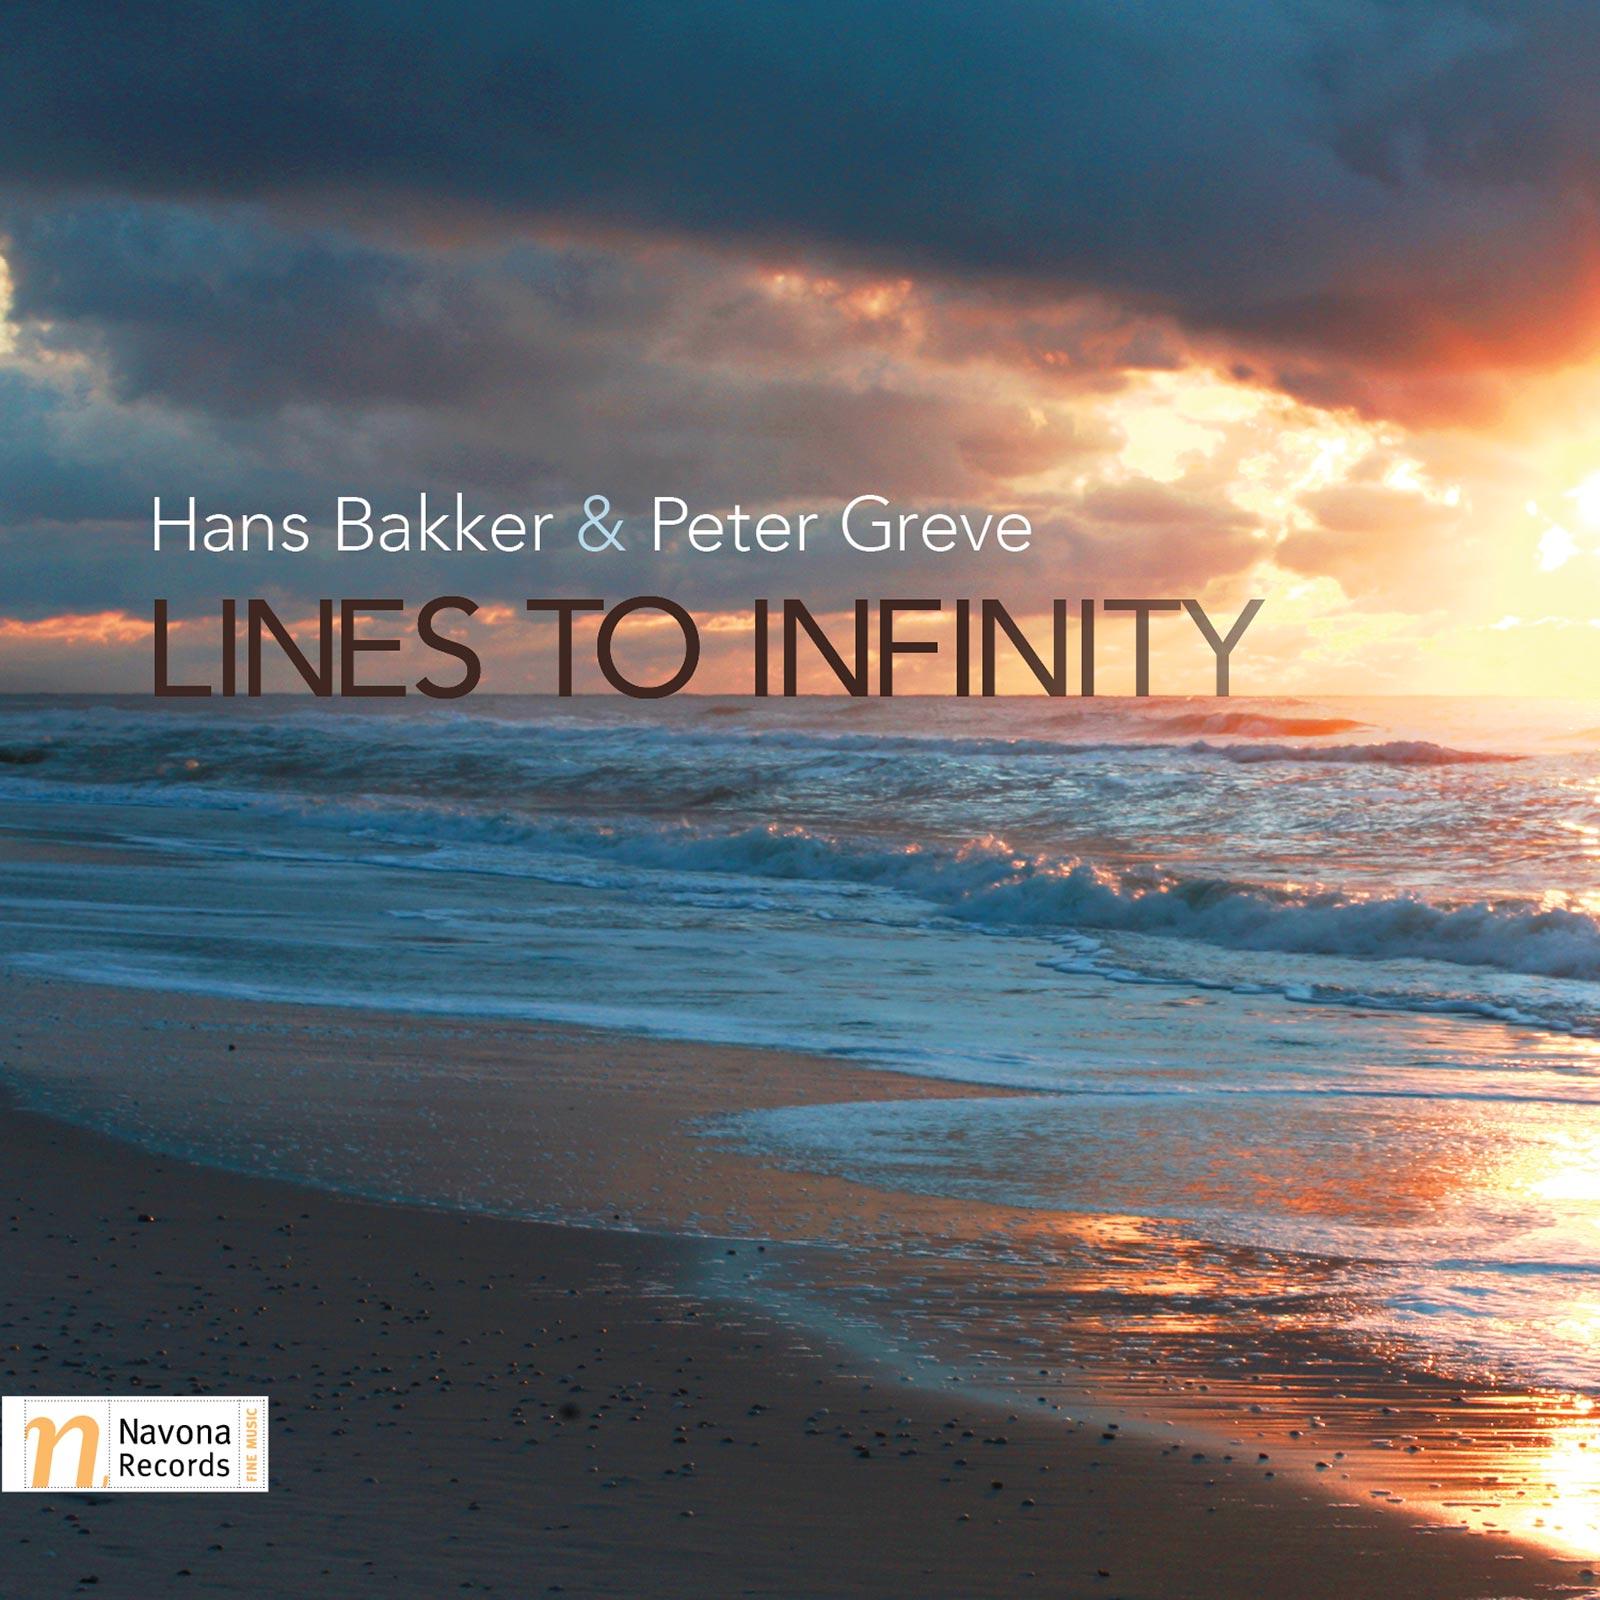 LINES TO INFINITY - album cover